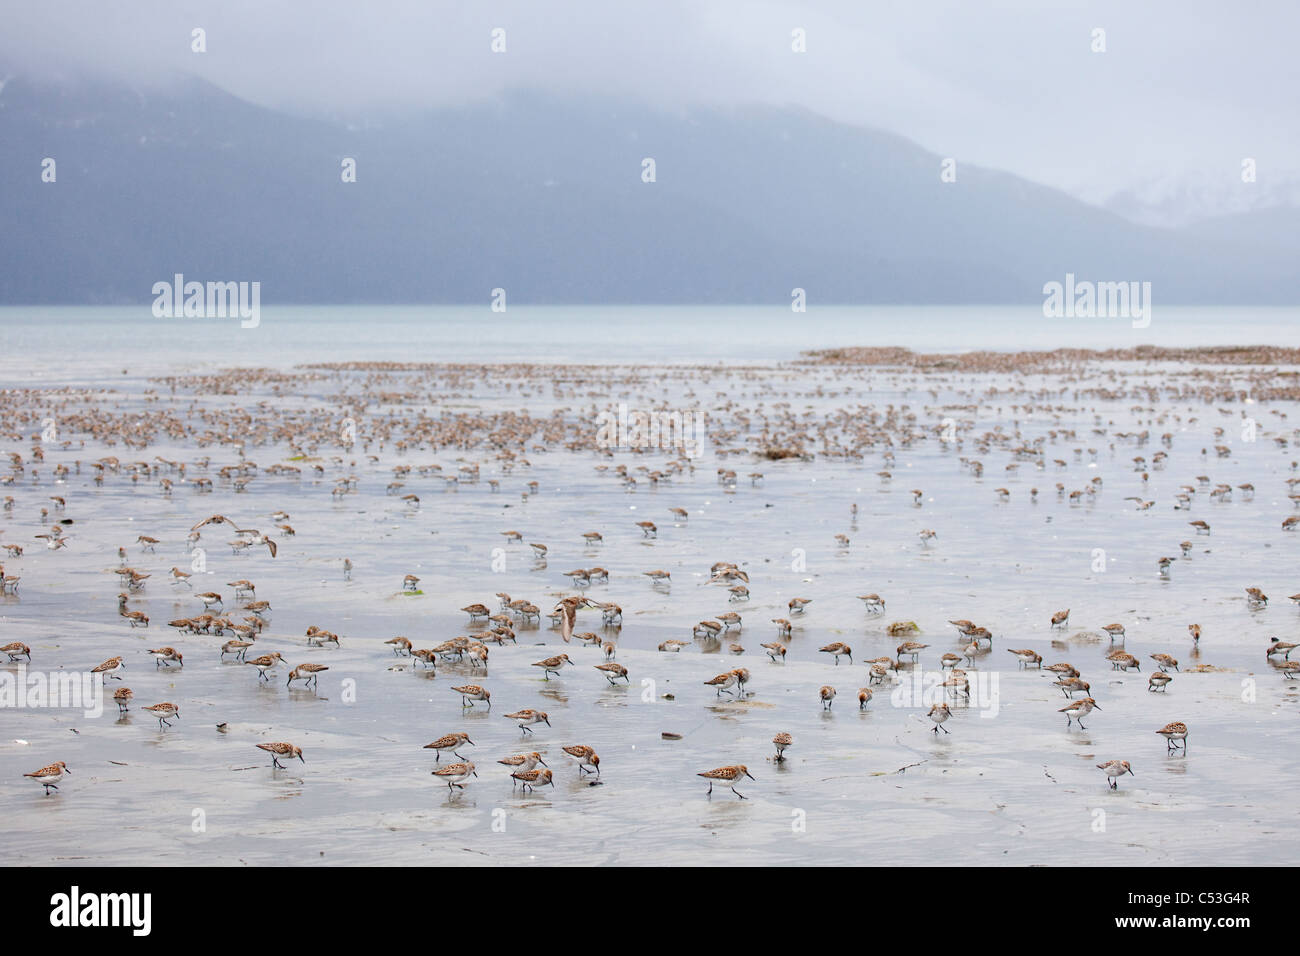 Shorebird flock scattered and feeding on mud flats of Hartney Bay during Spring migration, Copper River Delta, Alaska - Stock Image